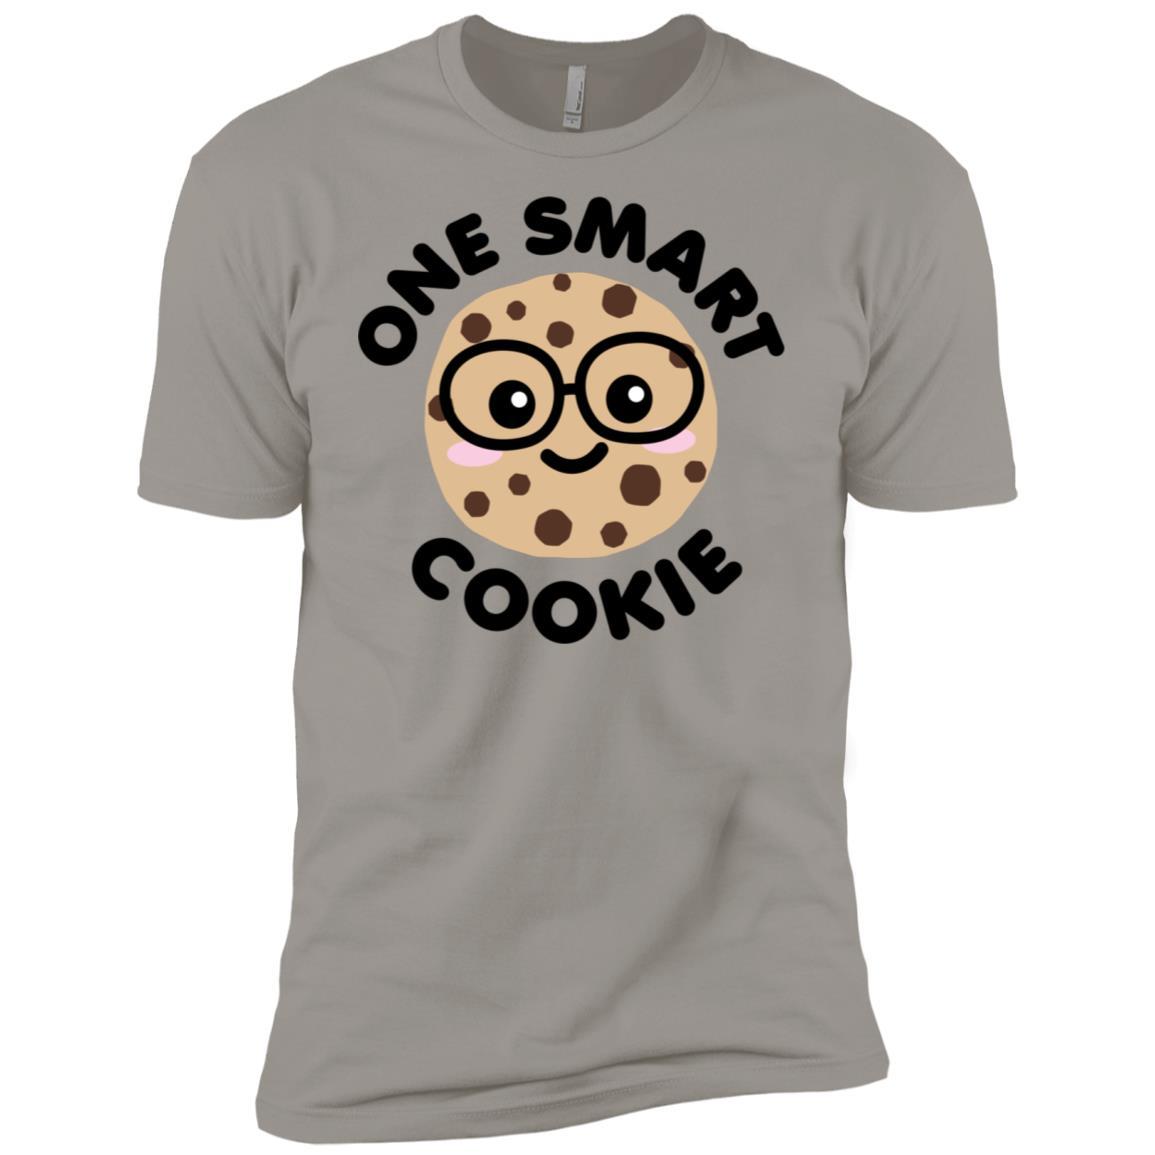 One Smart Cookie Cute Kawaii Nerd Humor Men Short Sleeve T-Shirt